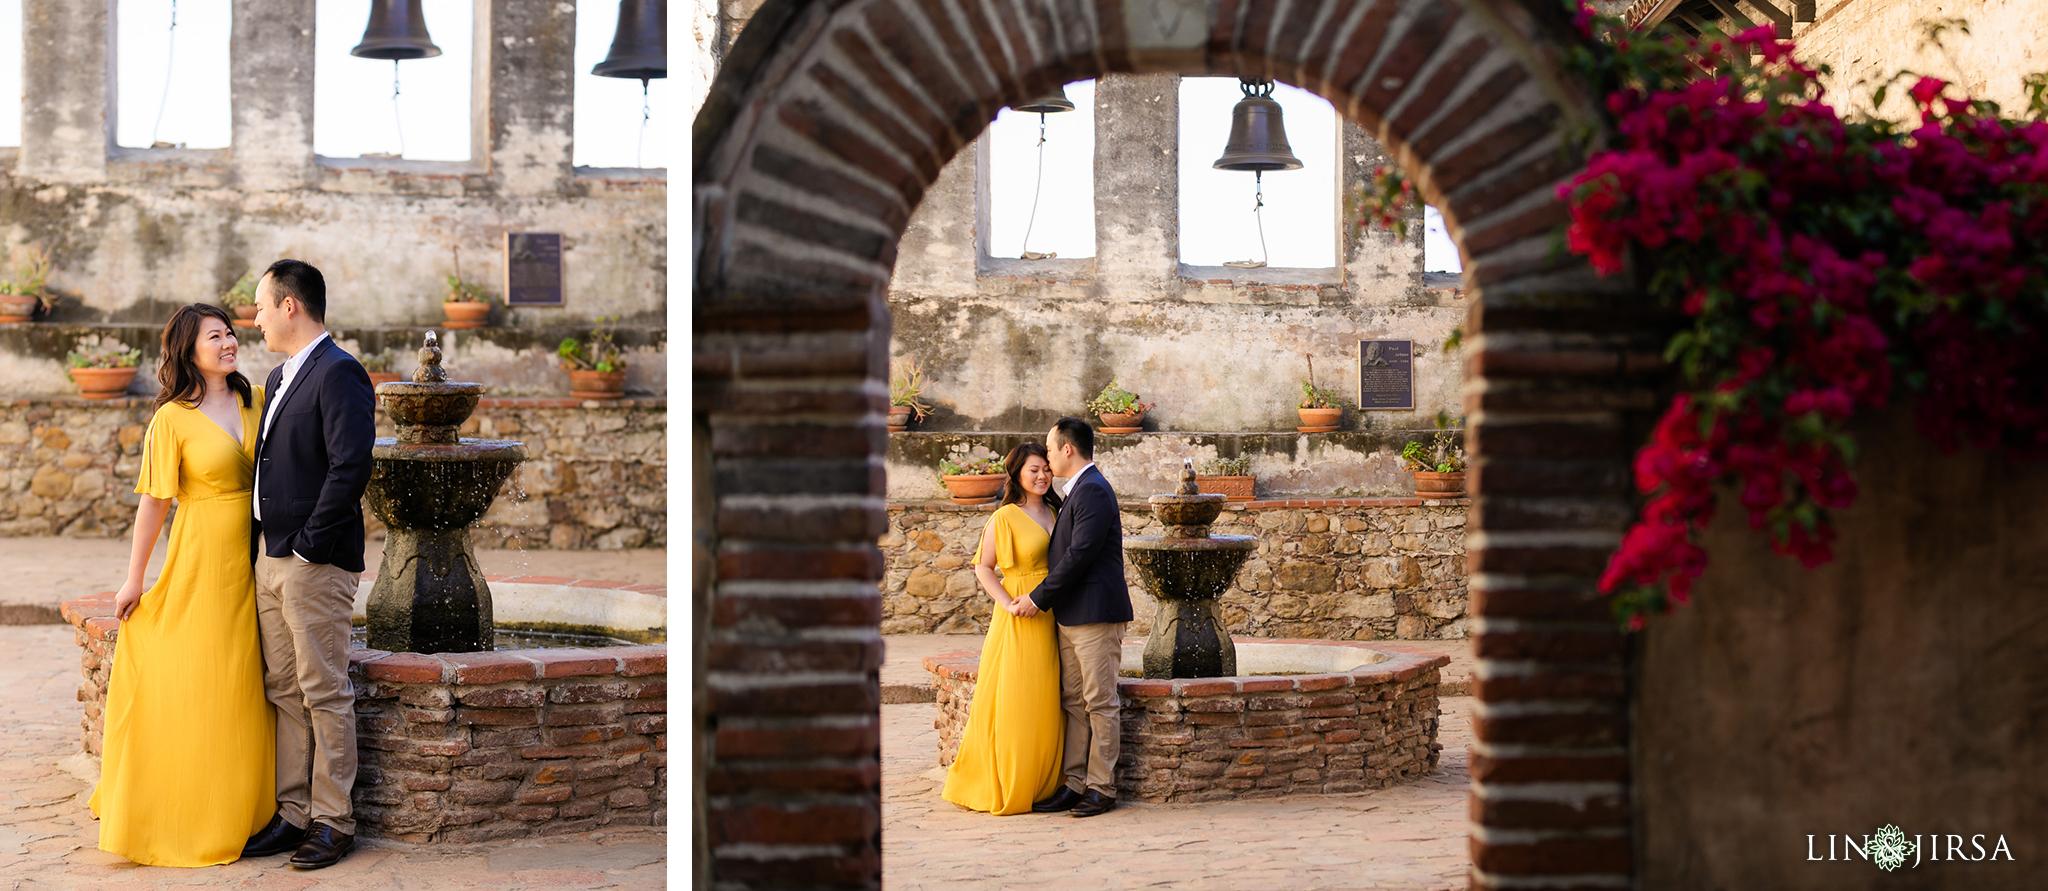 08 Mission San Juan Capistrano Engagement Photography